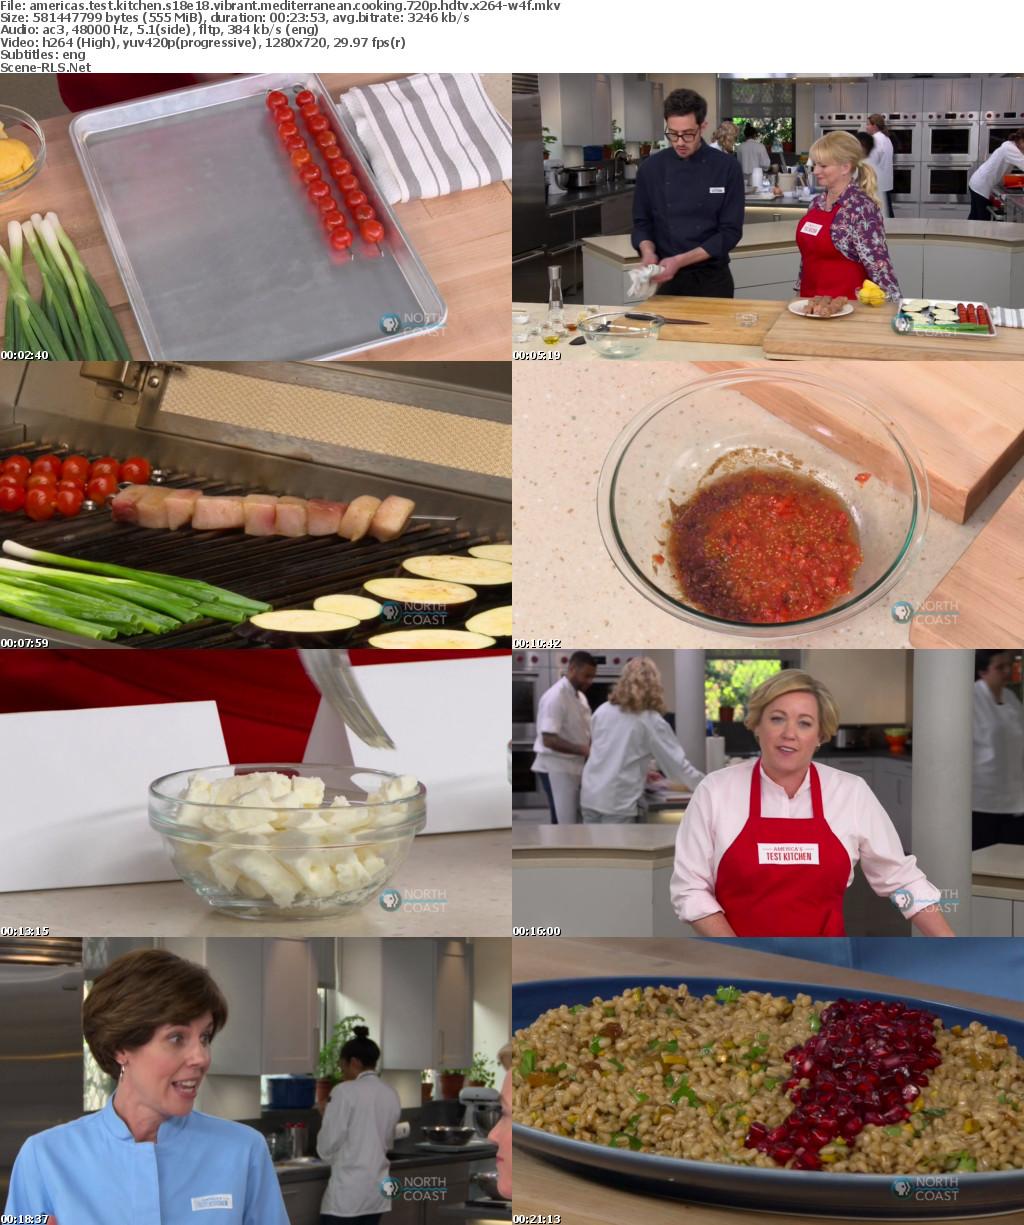 Americas Test Kitchen S18e18 Vibrant Mediterranean Cooking